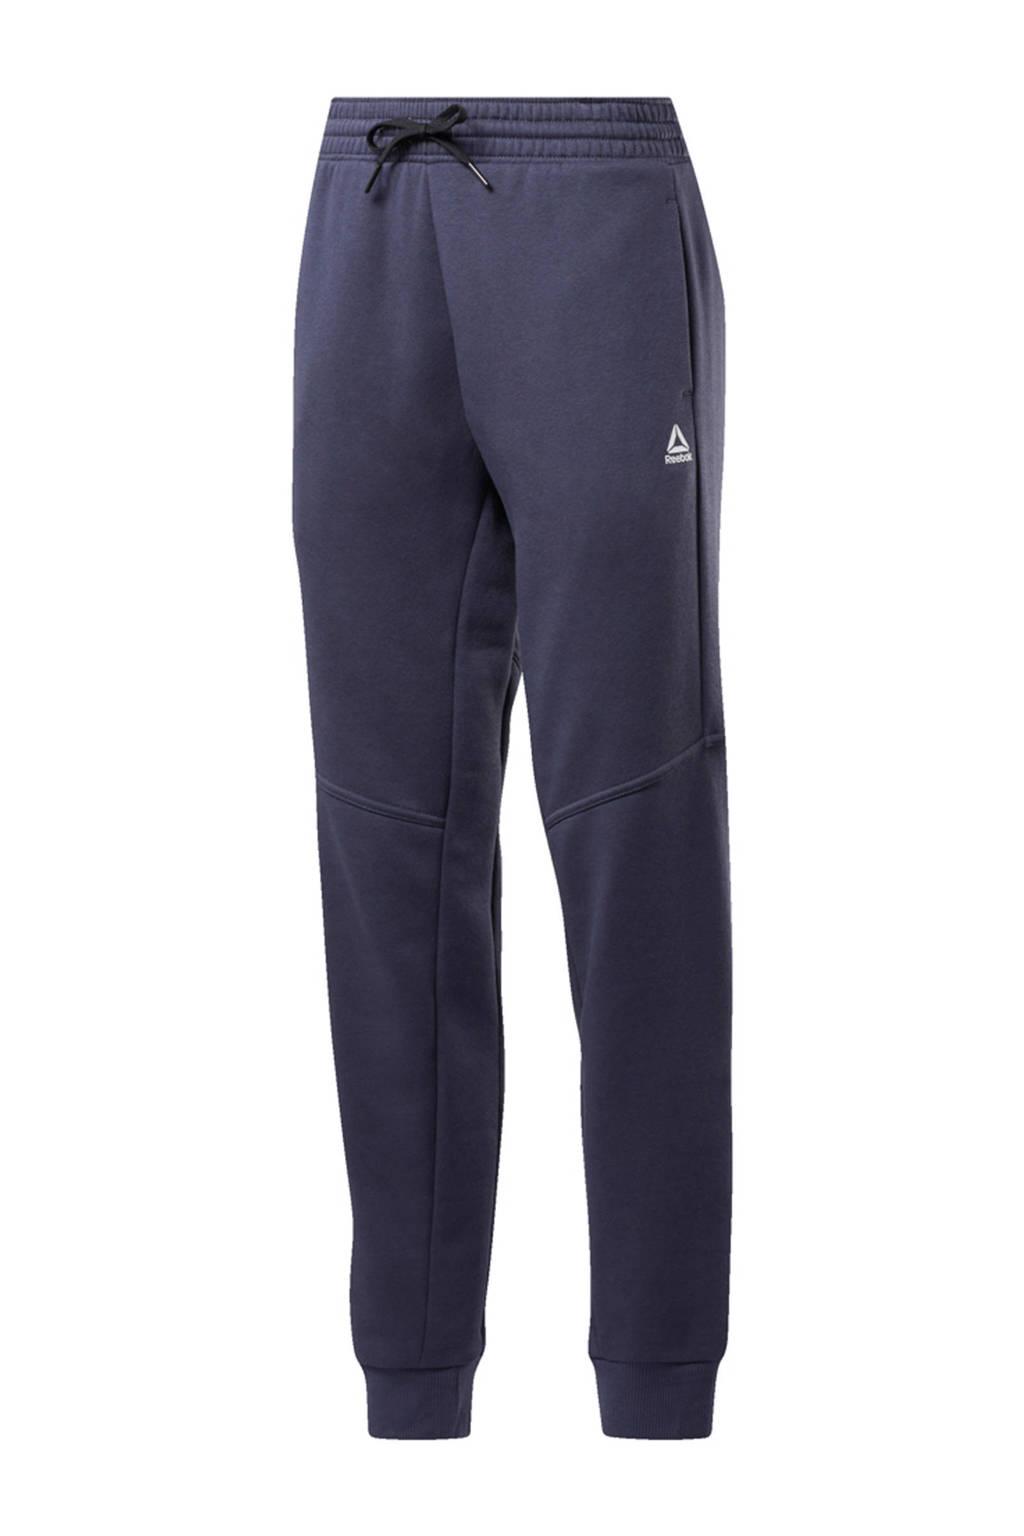 Reebok regular fit joggingbroek met logo donkerblauw/rood, Donkerblauw/rood